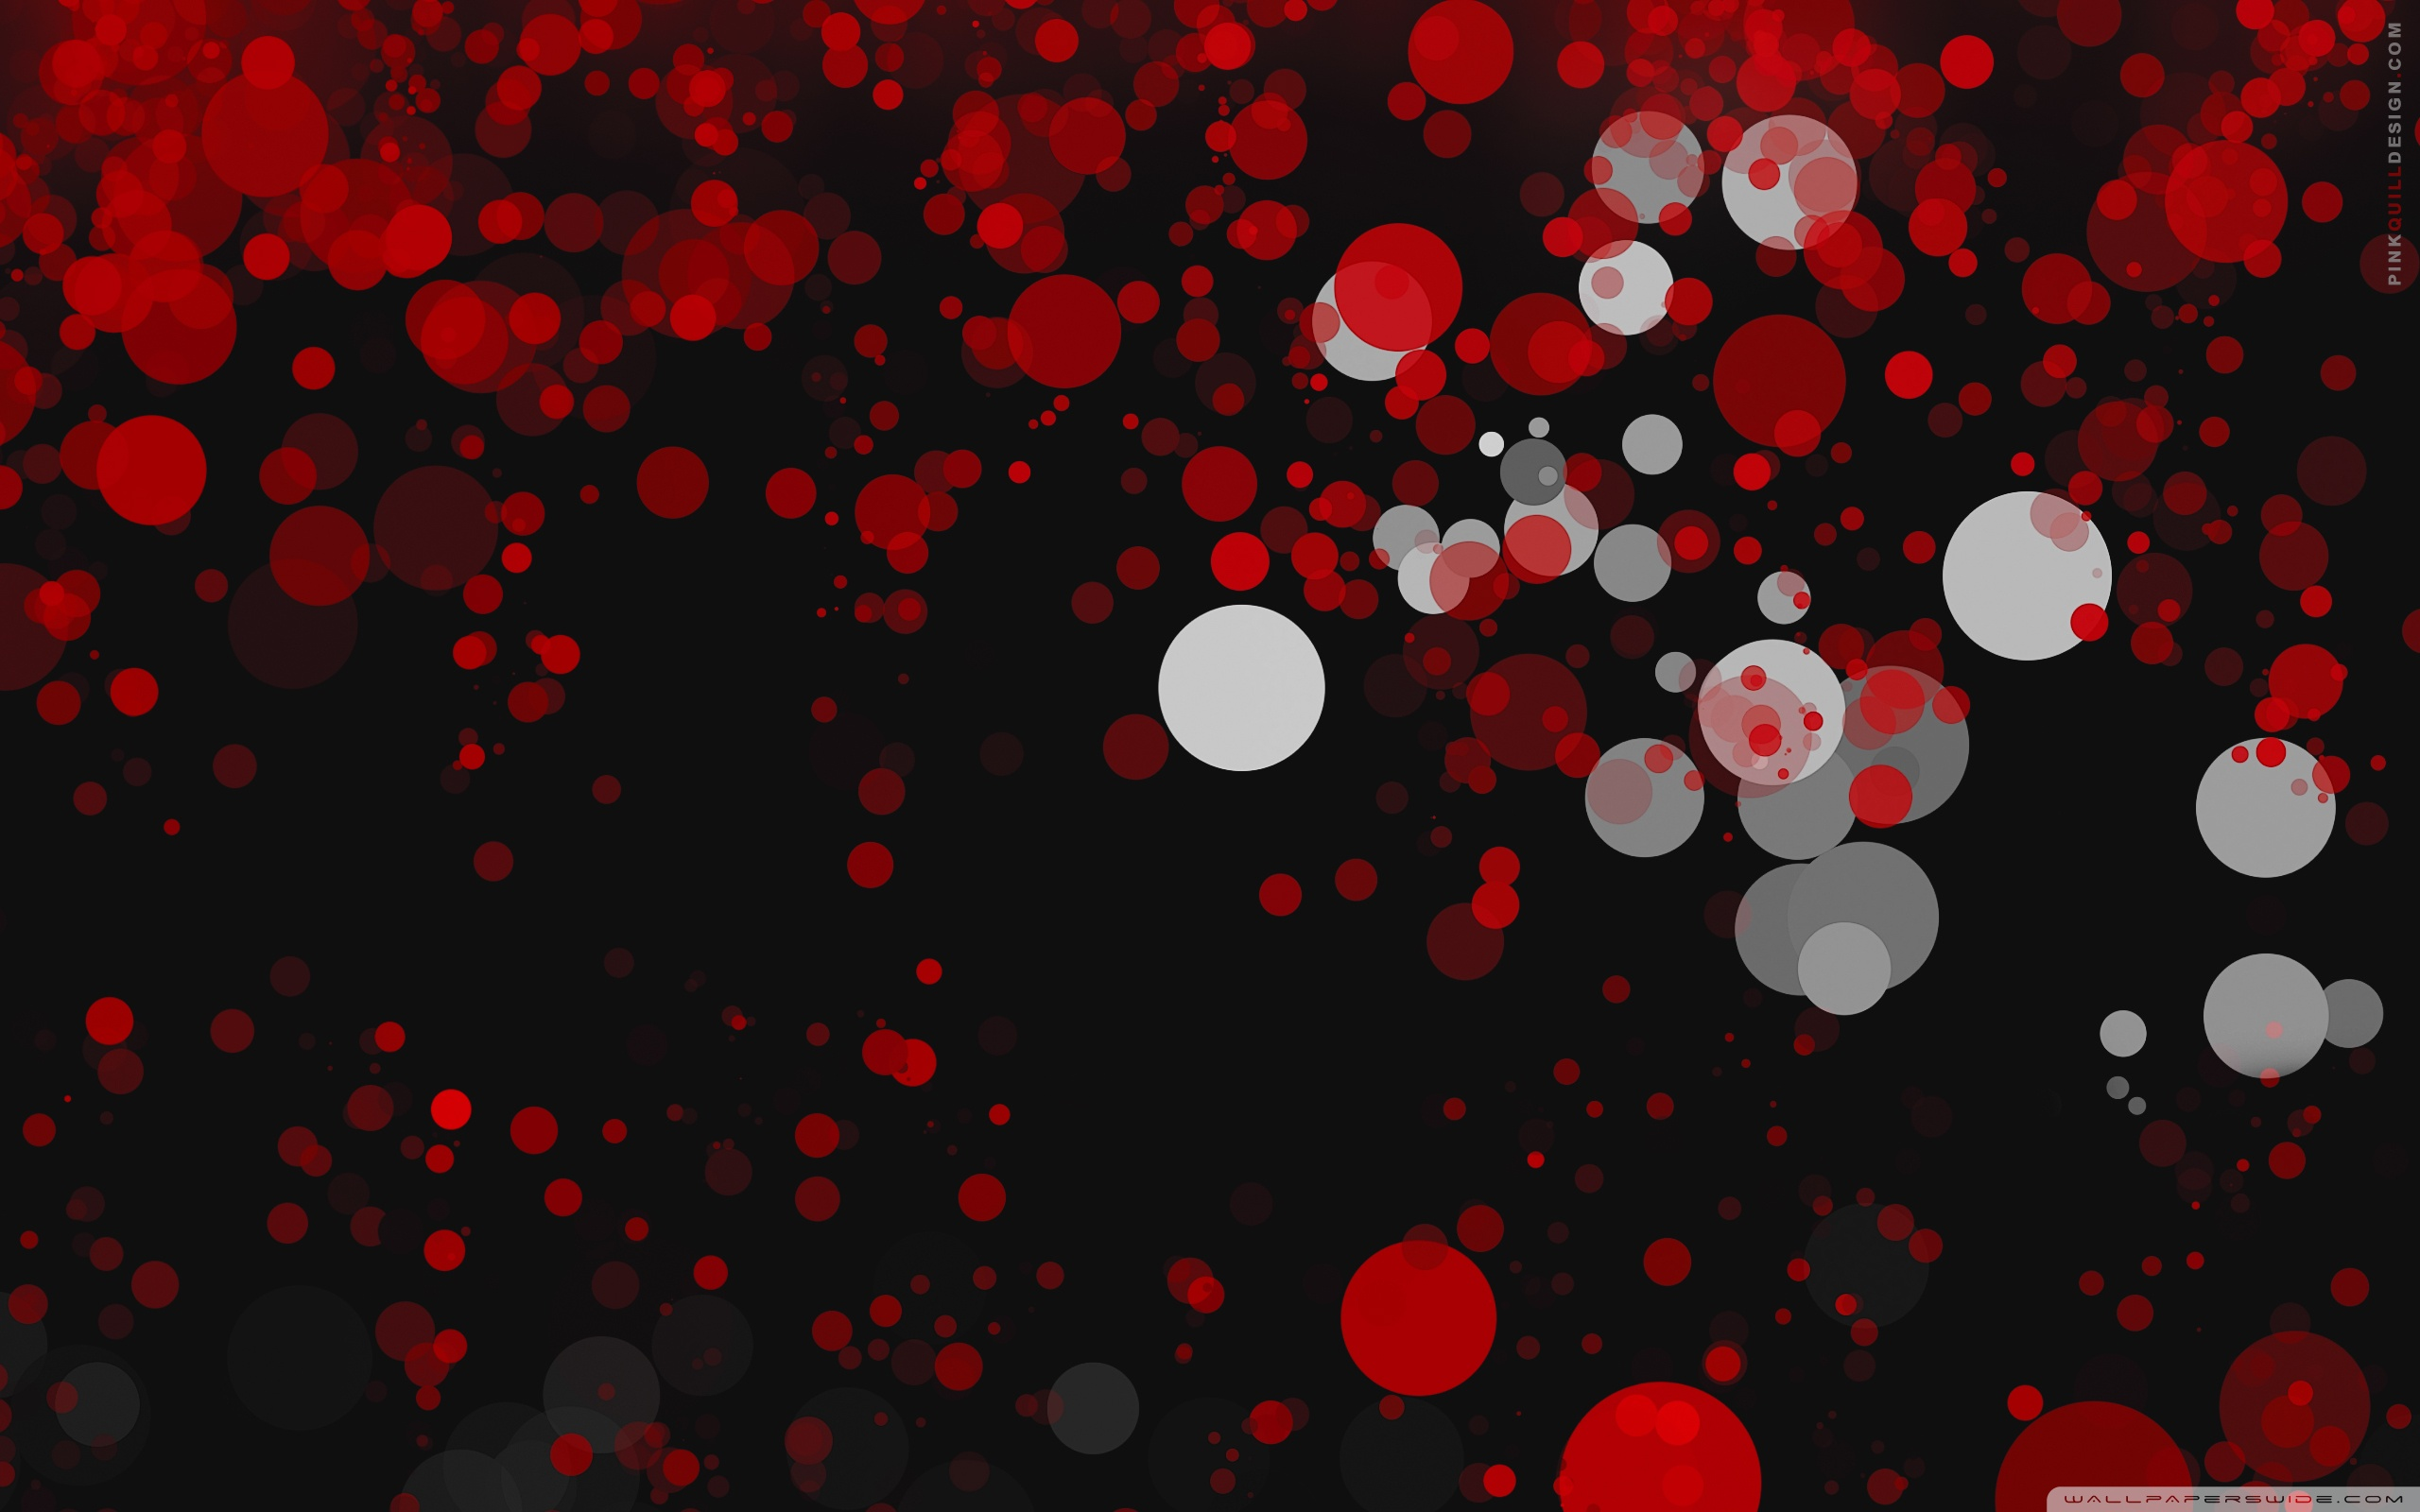 Red Dark Bokeh Ultra Hd Desktop Background Wallpaper For 4k